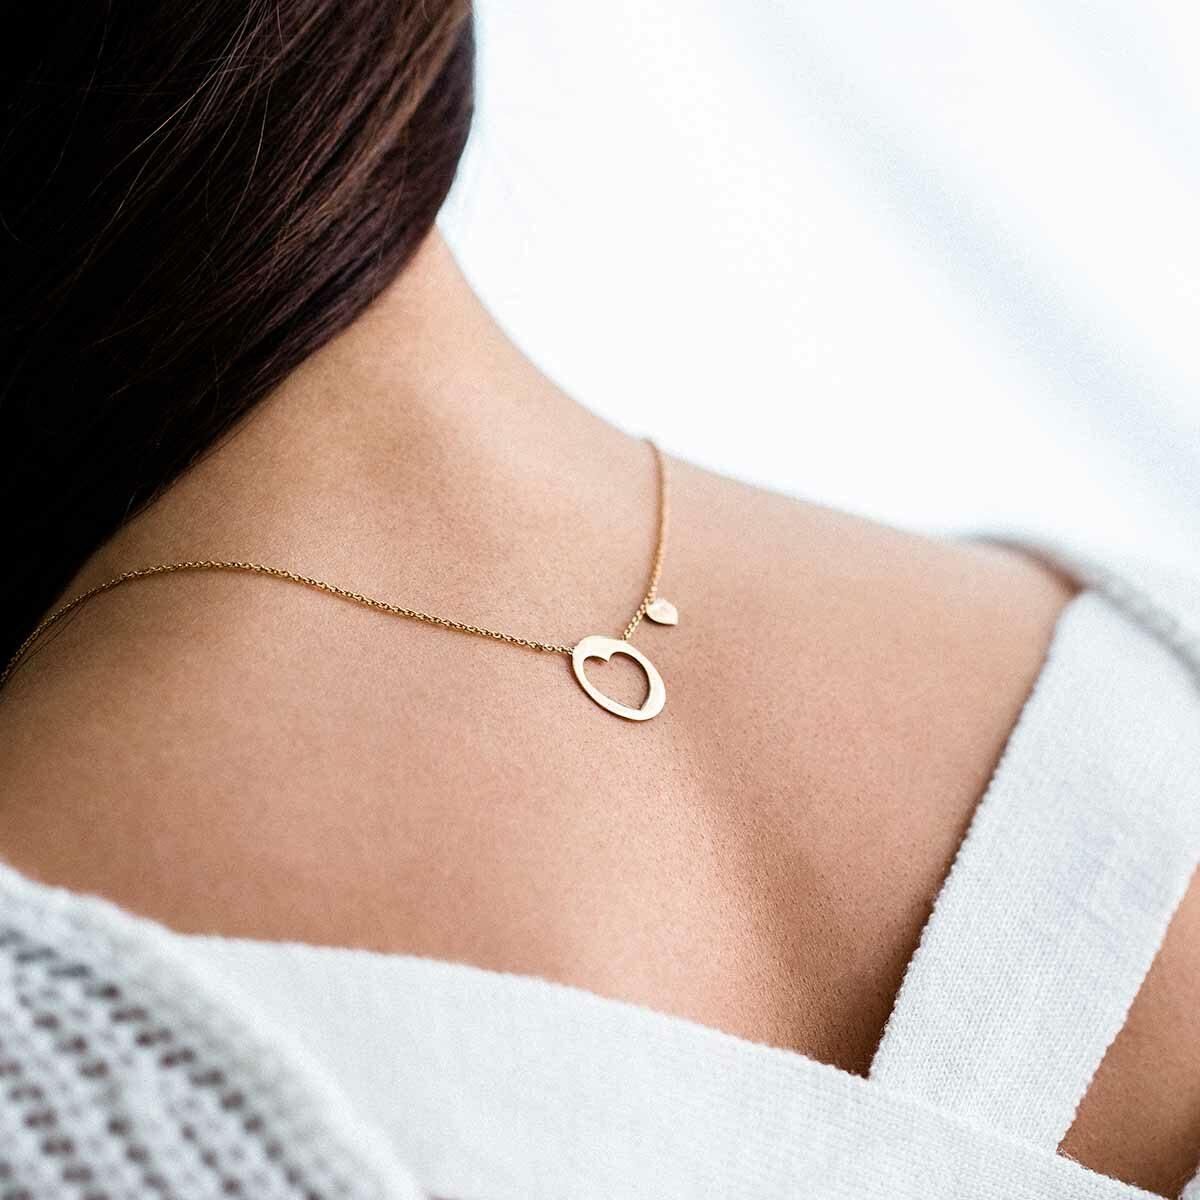 گردنبند طلا پلاک قلب بزرگ پرسته